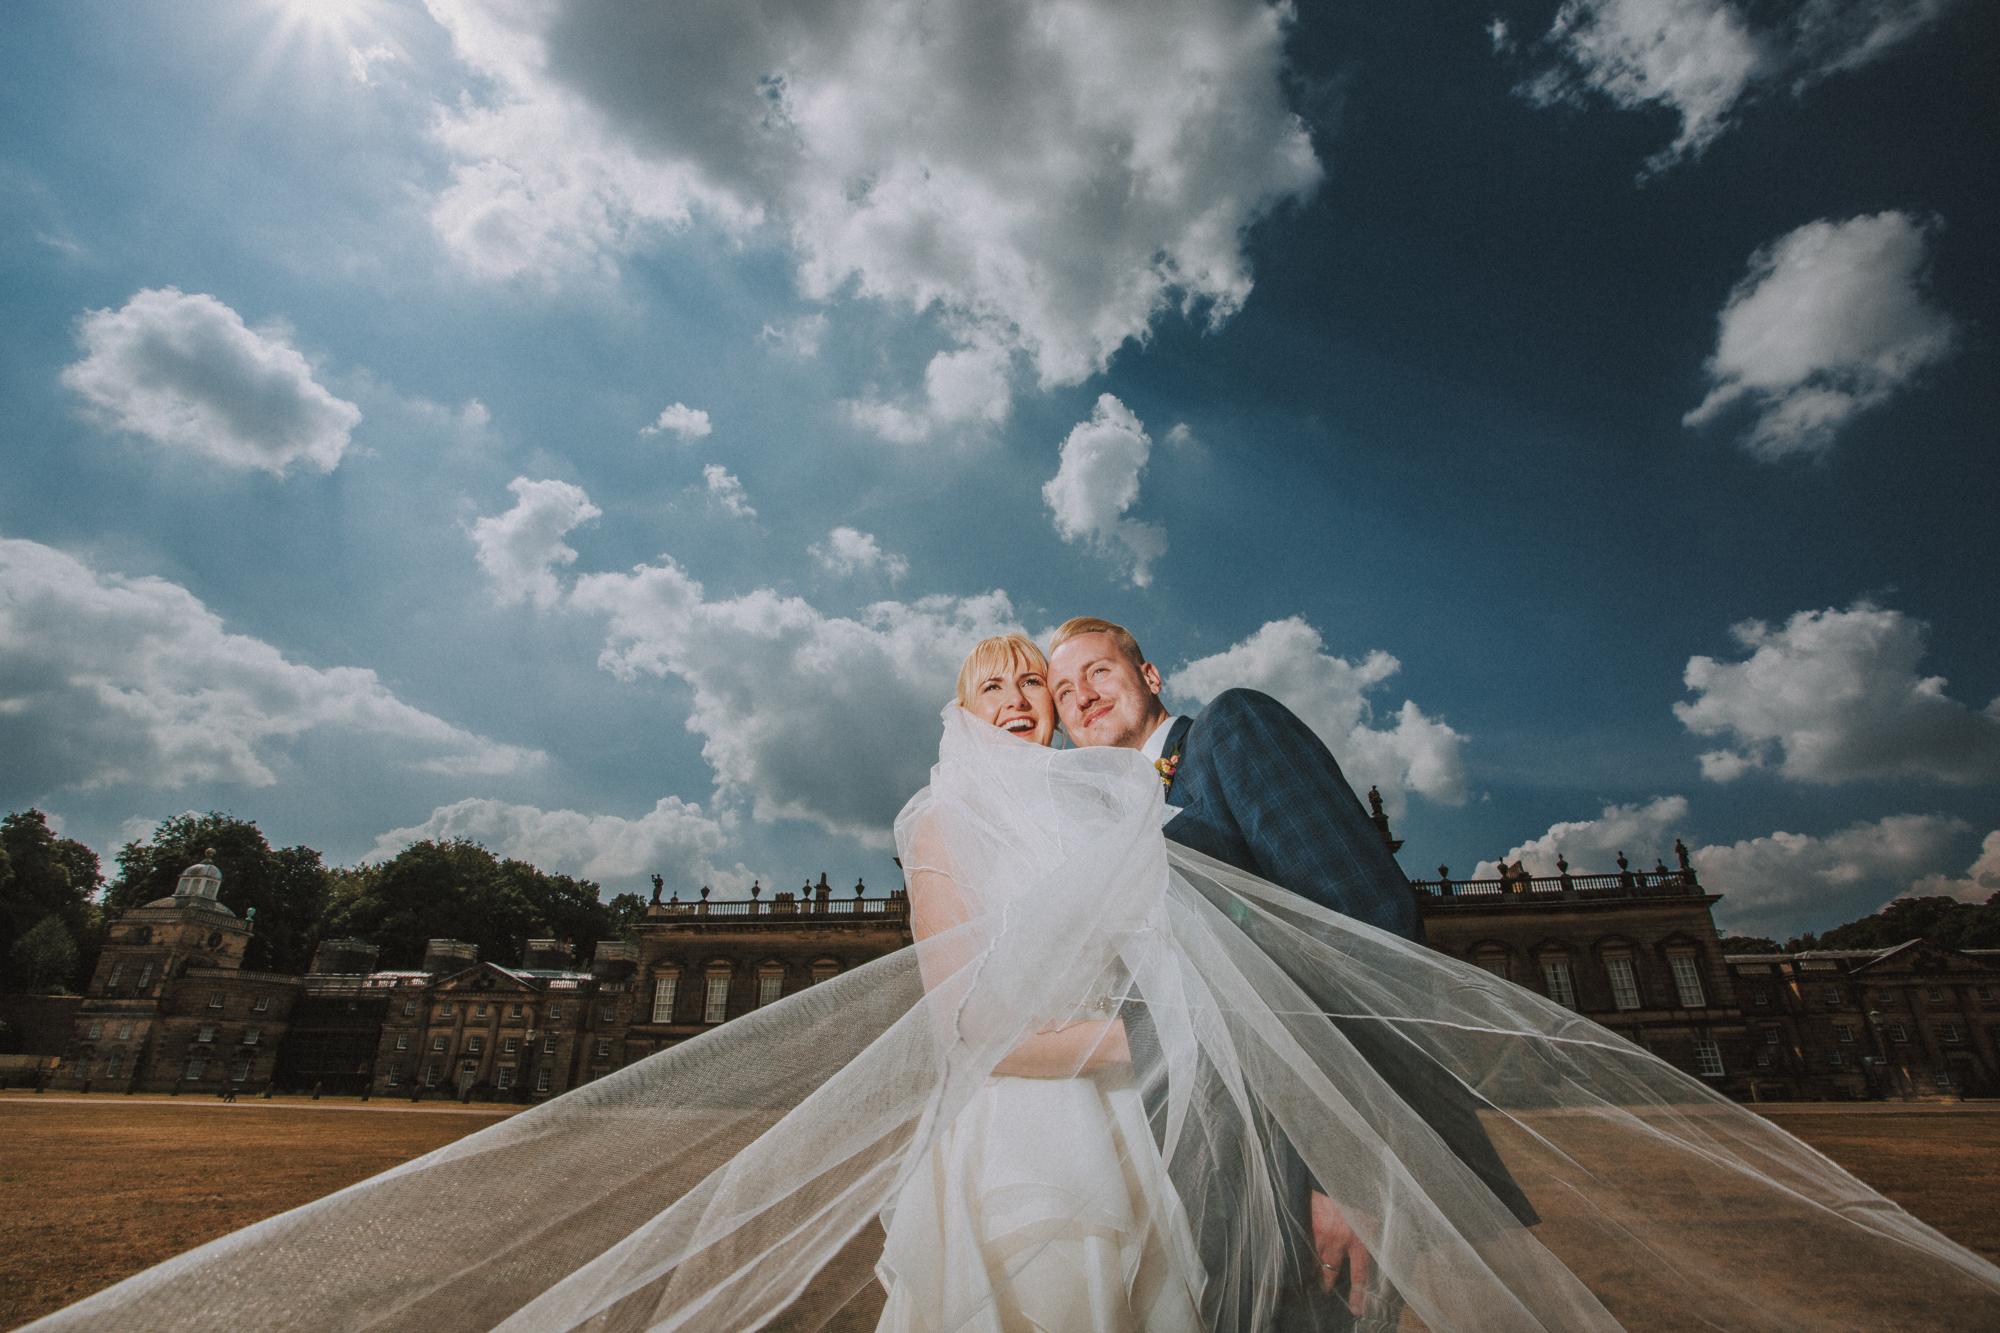 wentworth woodhouse wedding photographers yorkshire4.jpg